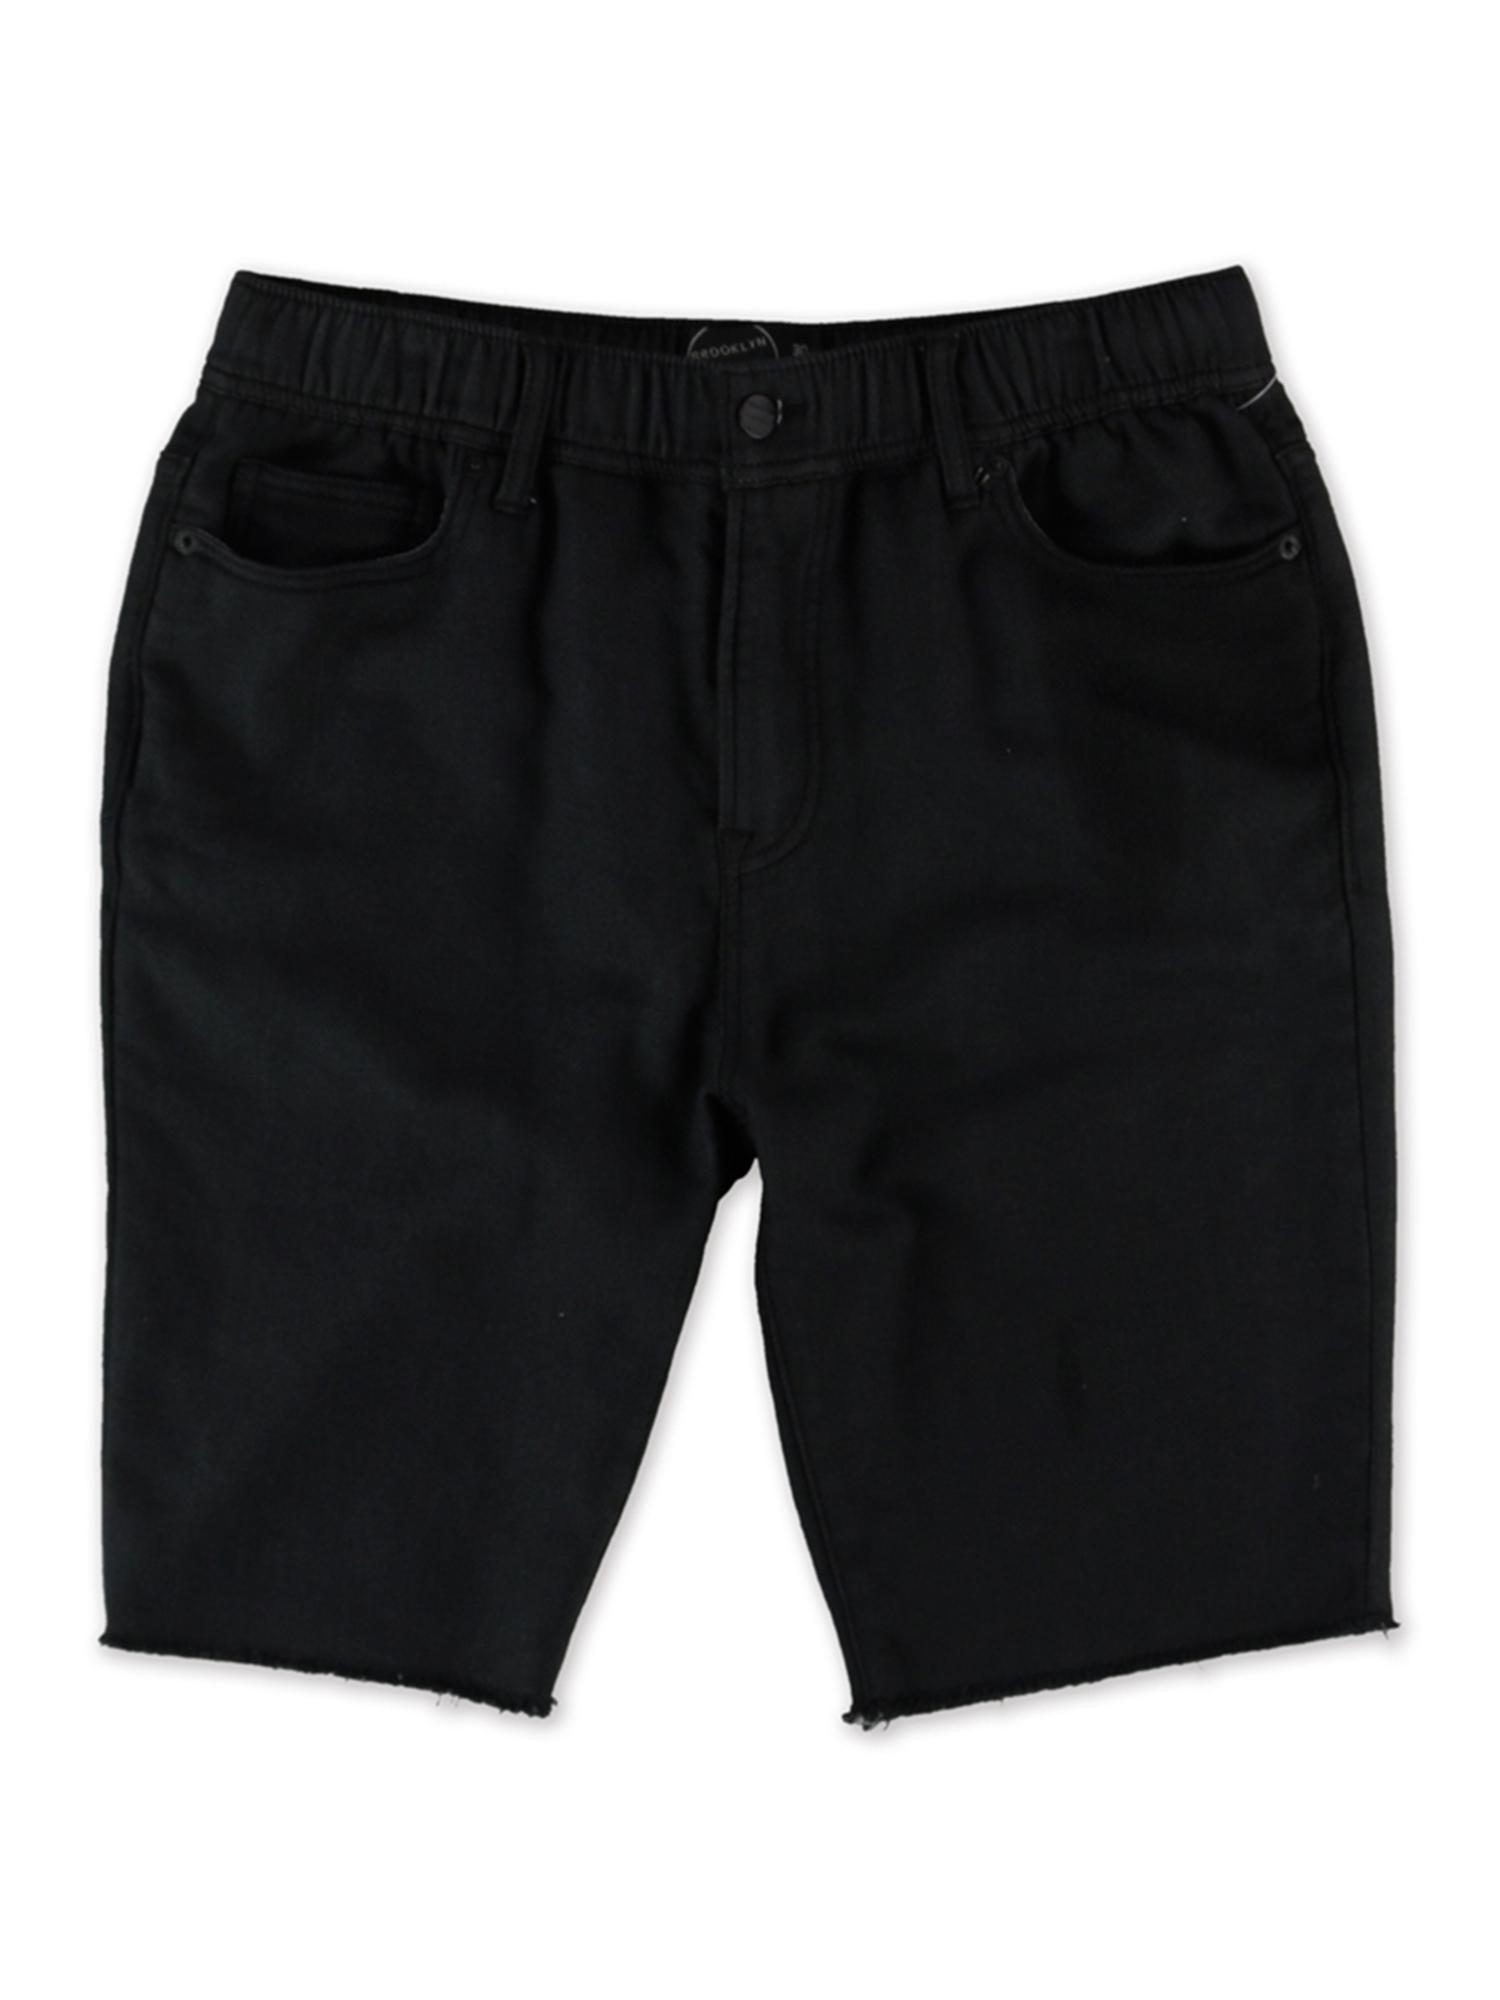 Aeropostale Mens Washed Jogger Casual Denim Shorts